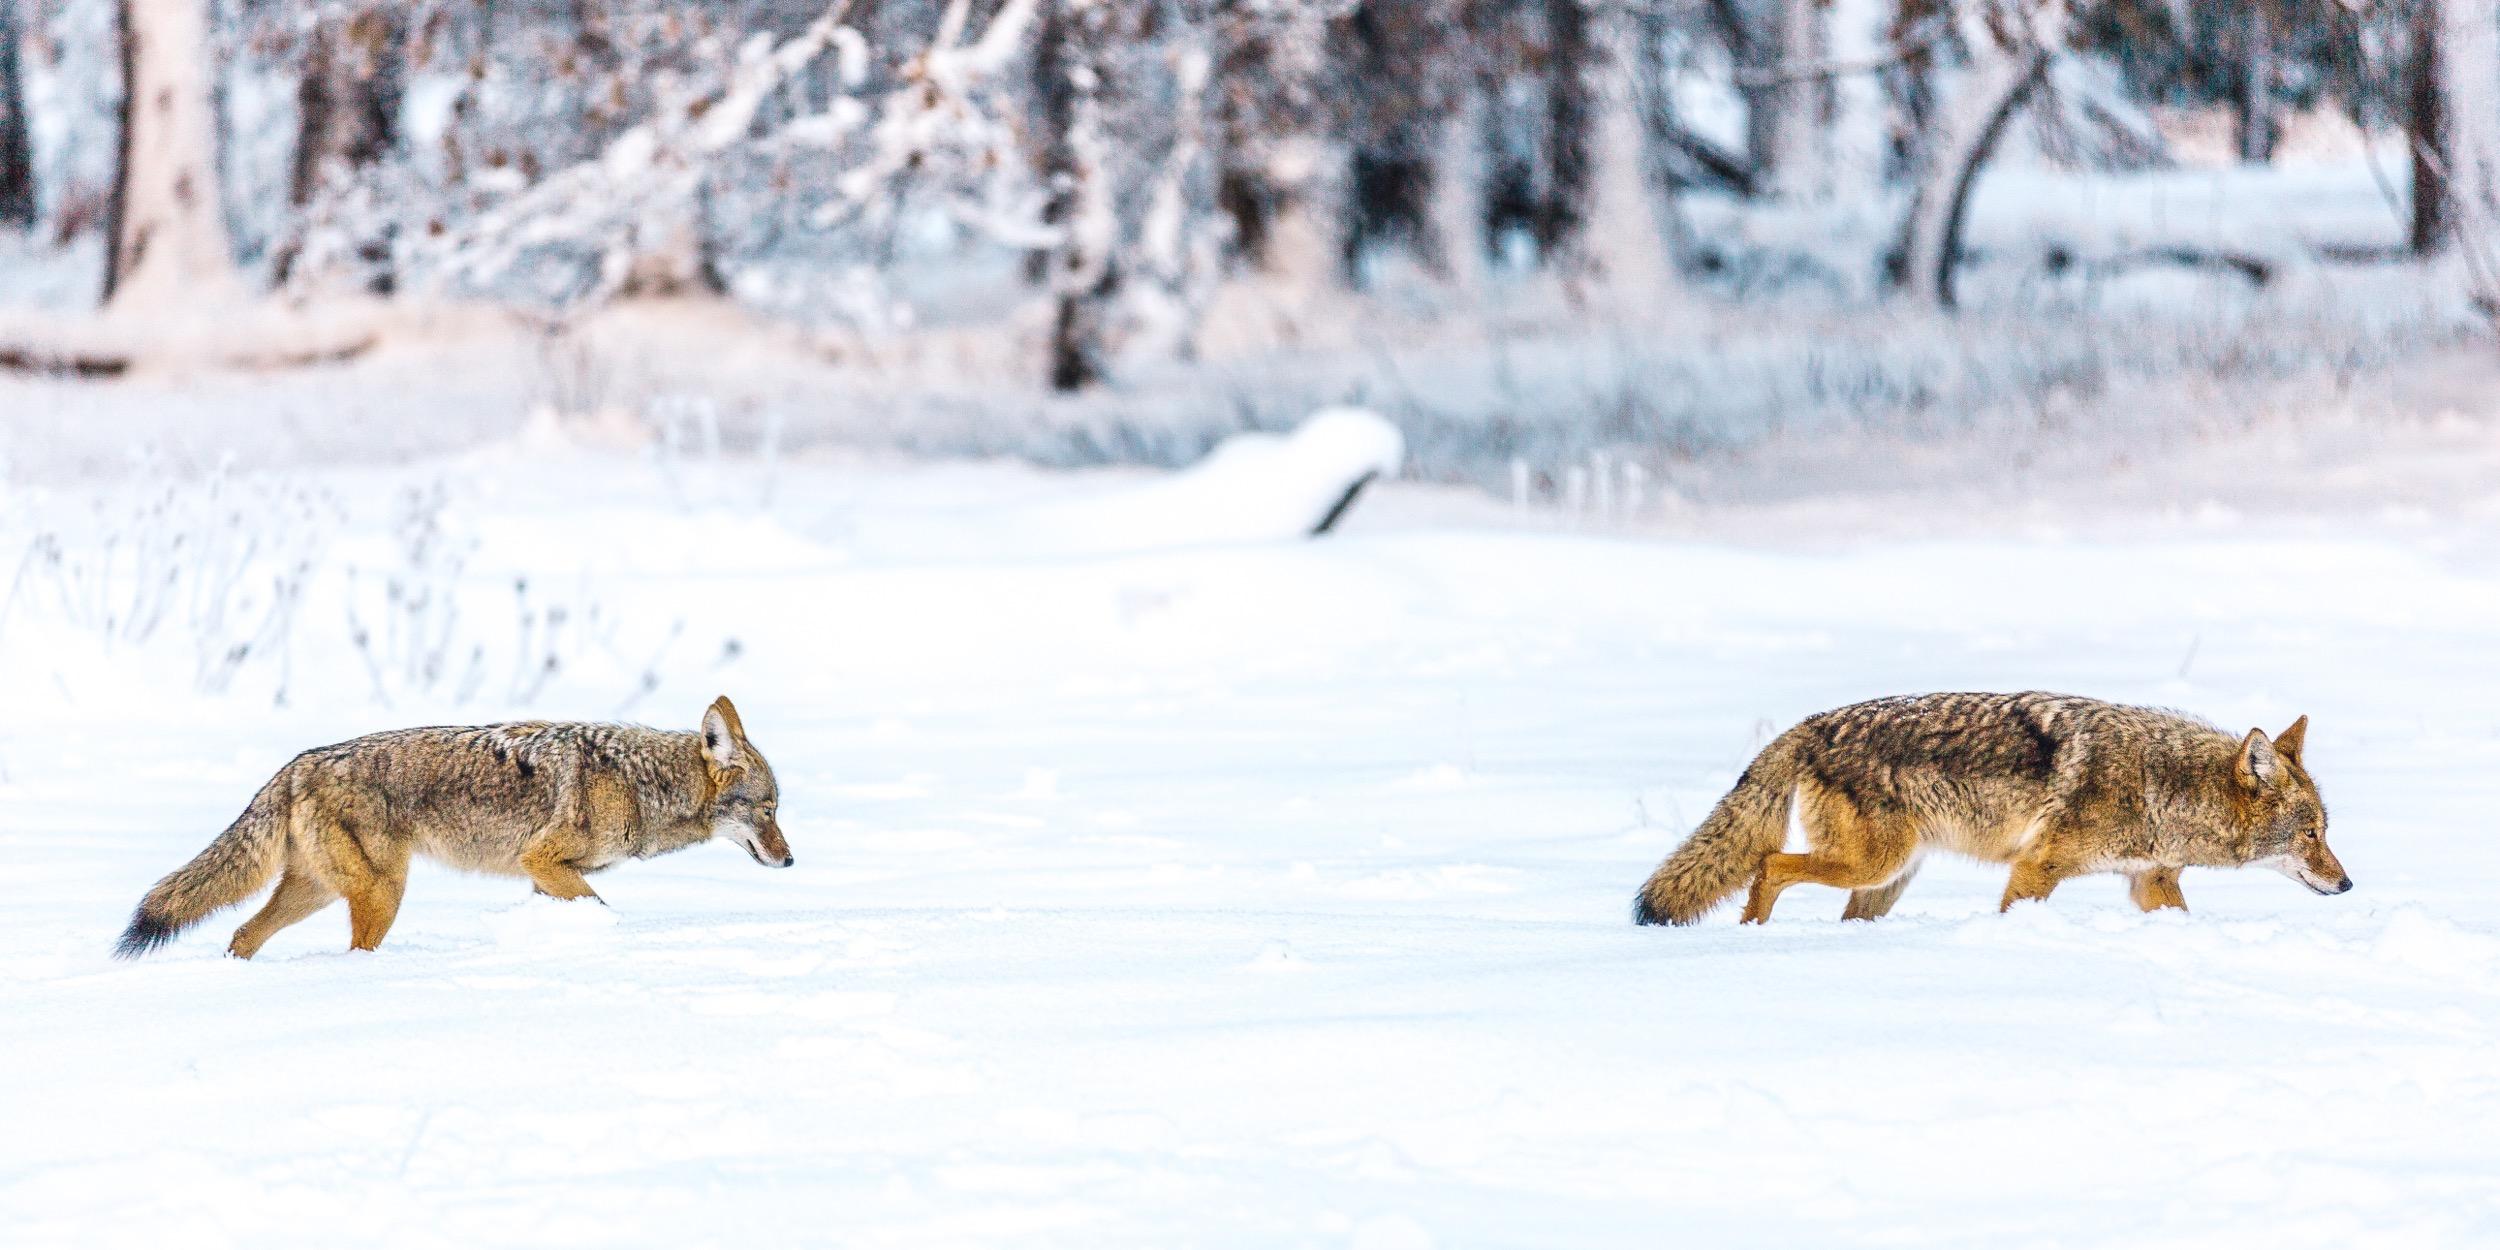 KimCarroll.com - Yosemite coyote-1.jpg